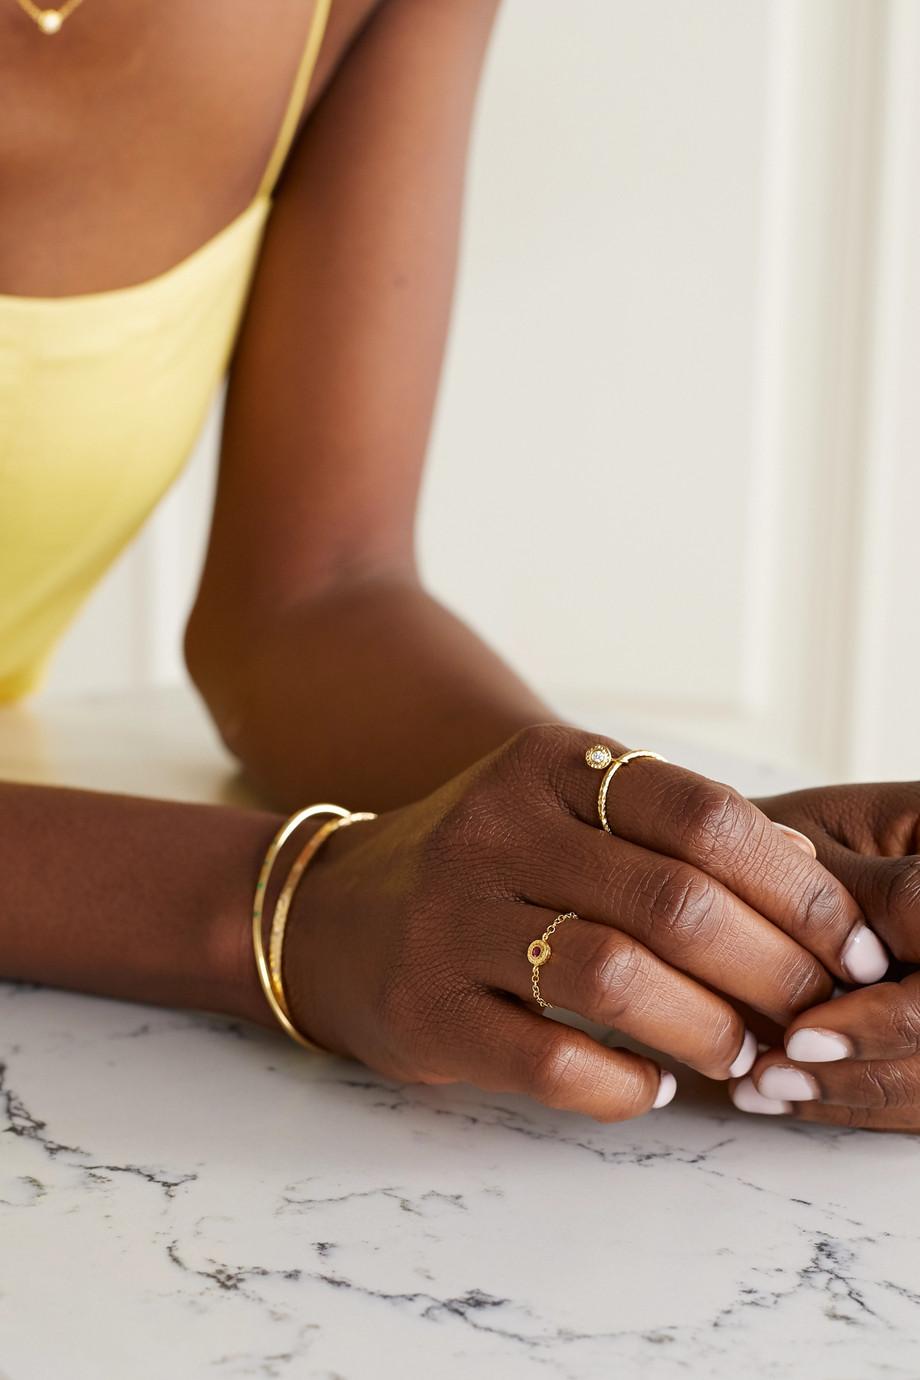 Octavia Elizabeth + NET SUSTAIN Nesting Gem 18-karat gold ruby ring